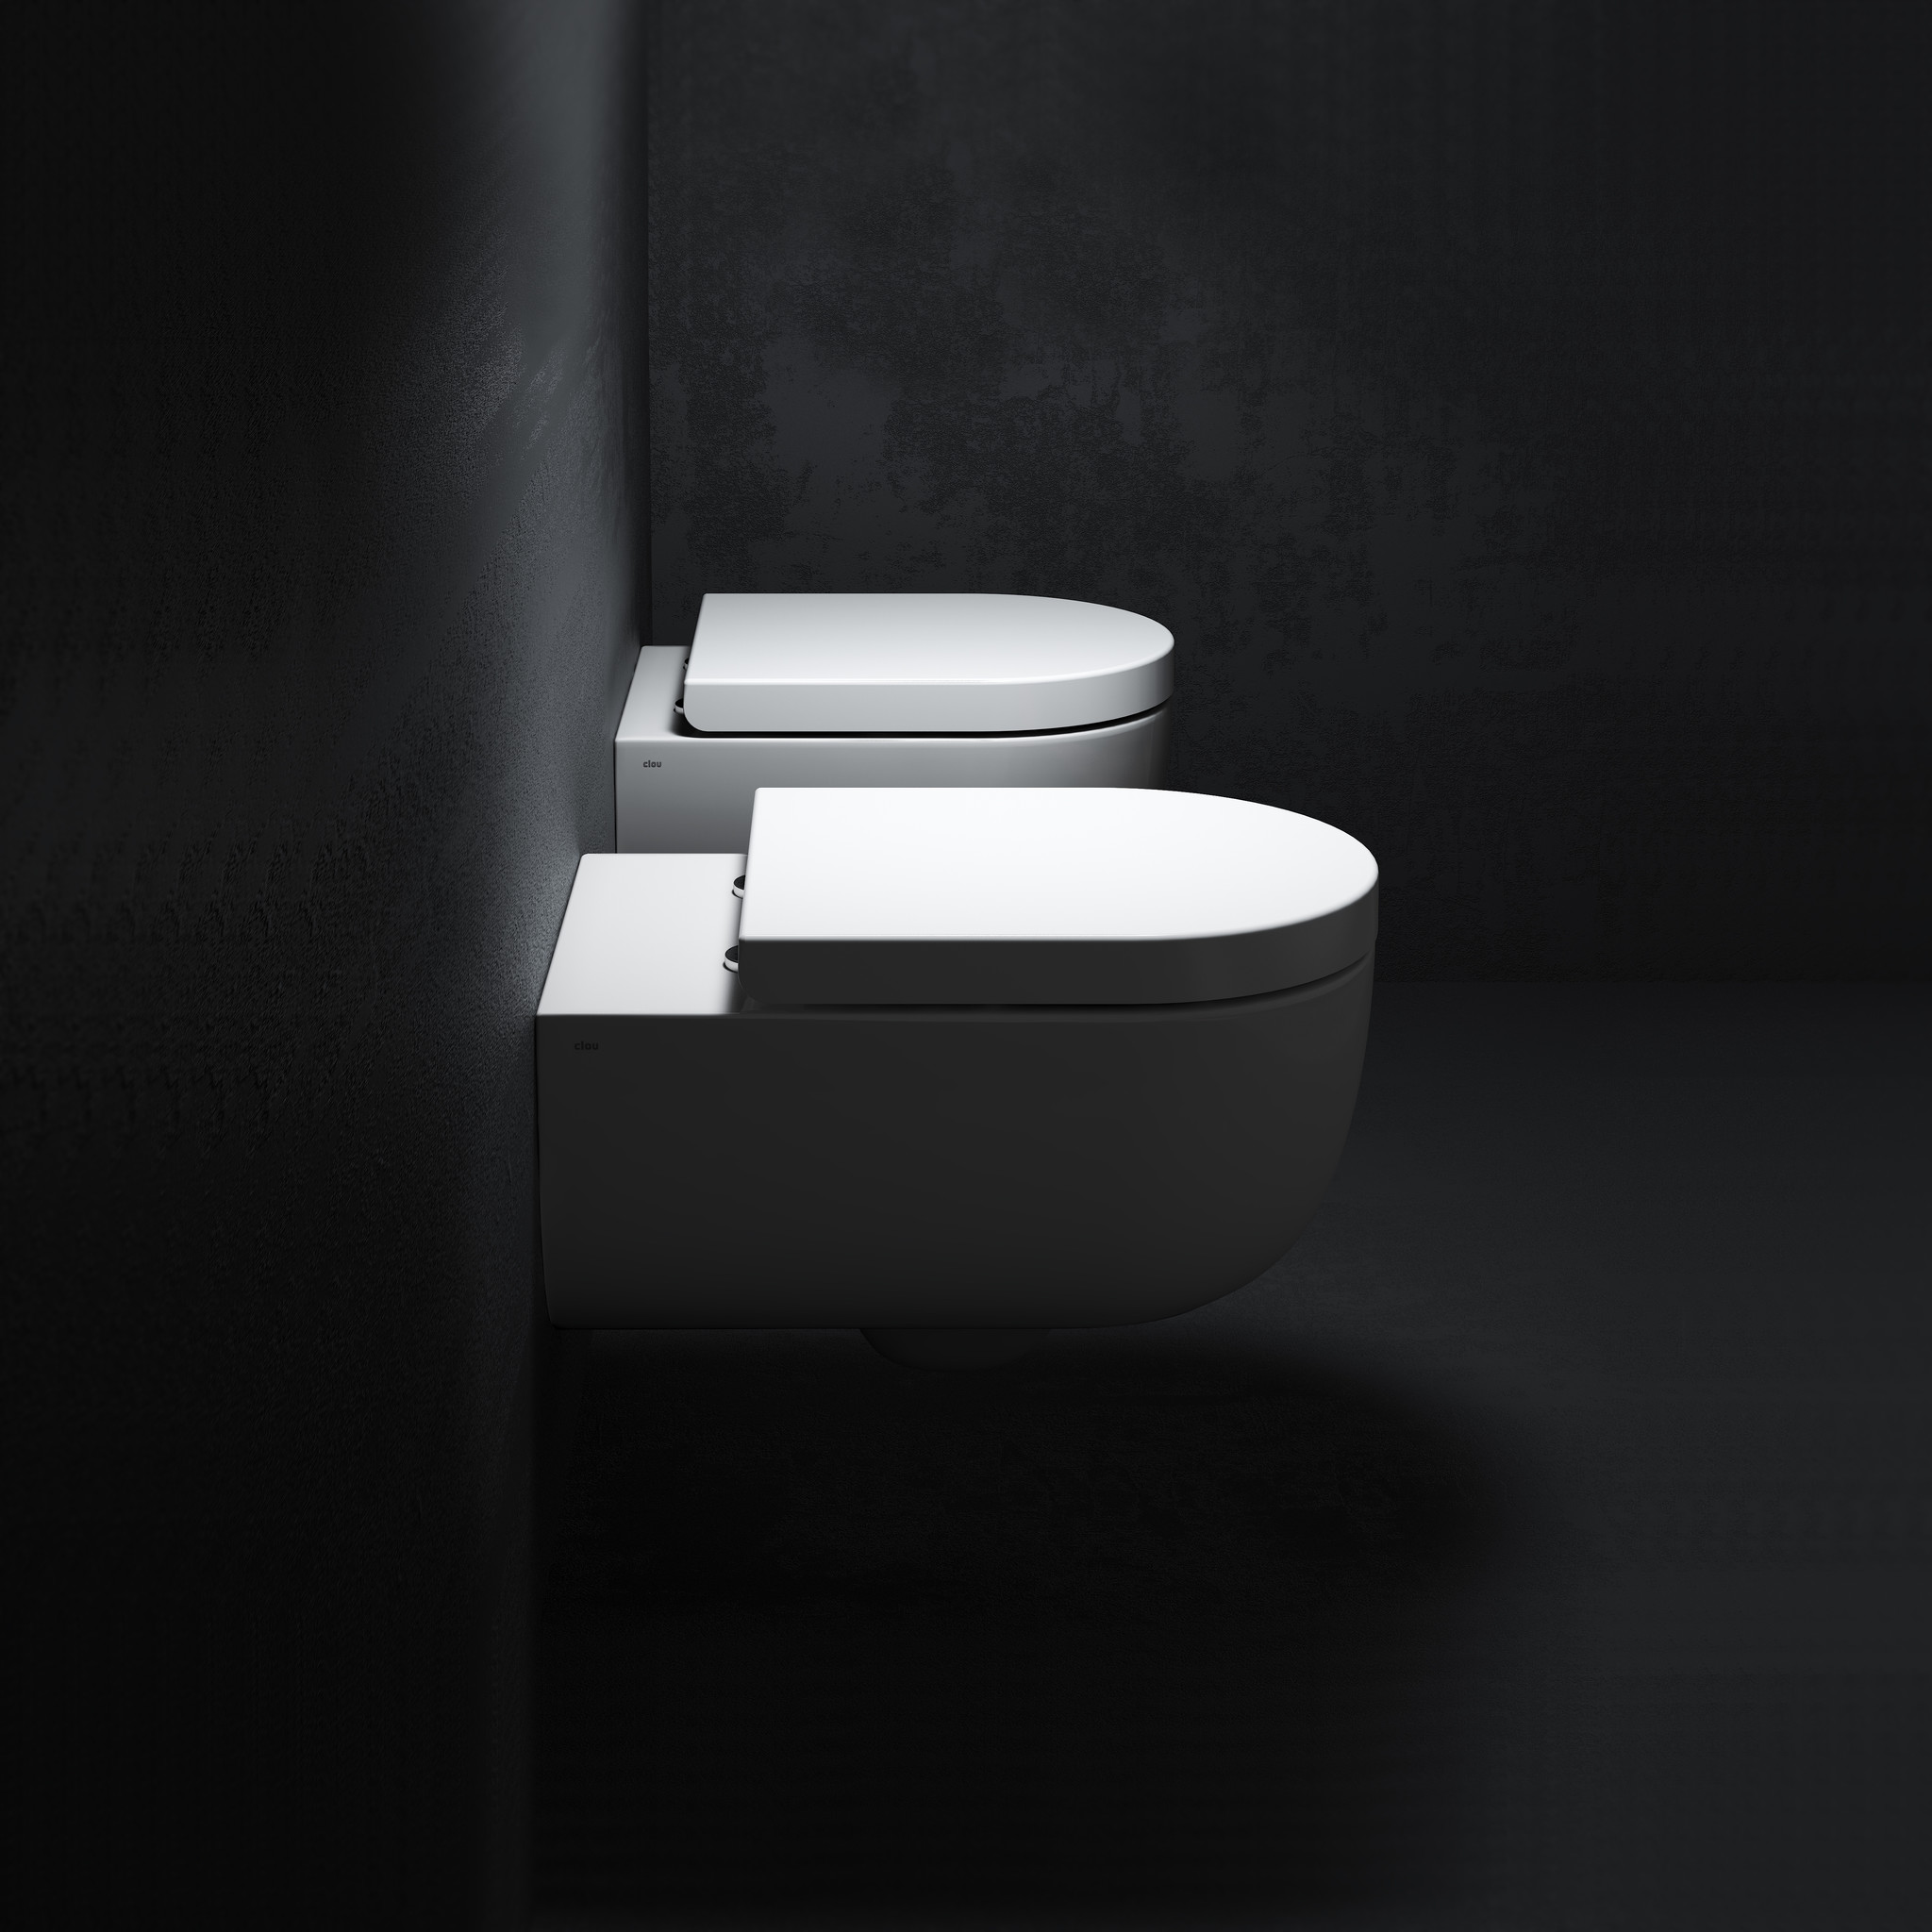 Hammock toilette 49cm sans bord, sans abattant